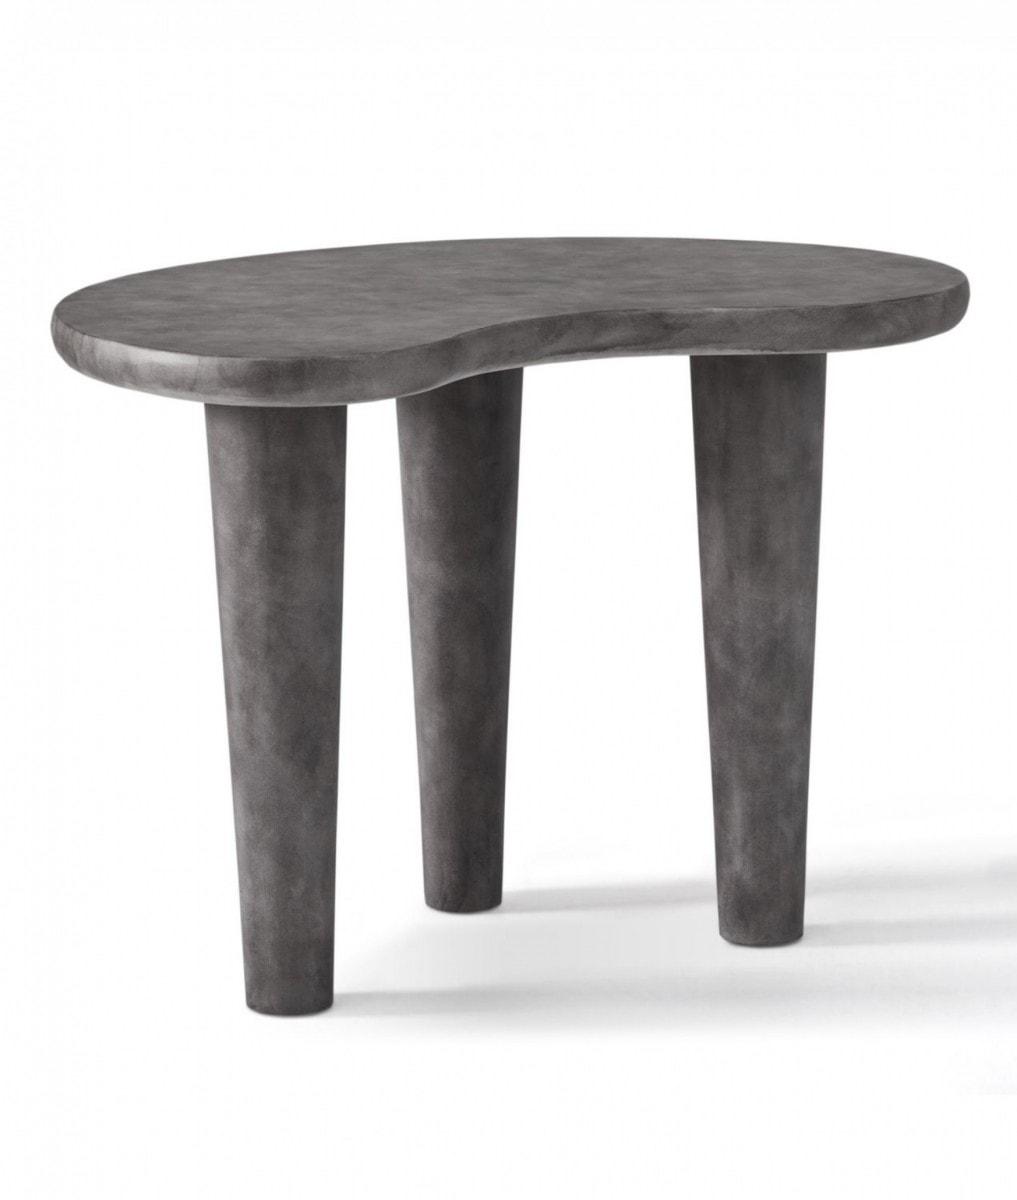 palette-side-table-636712